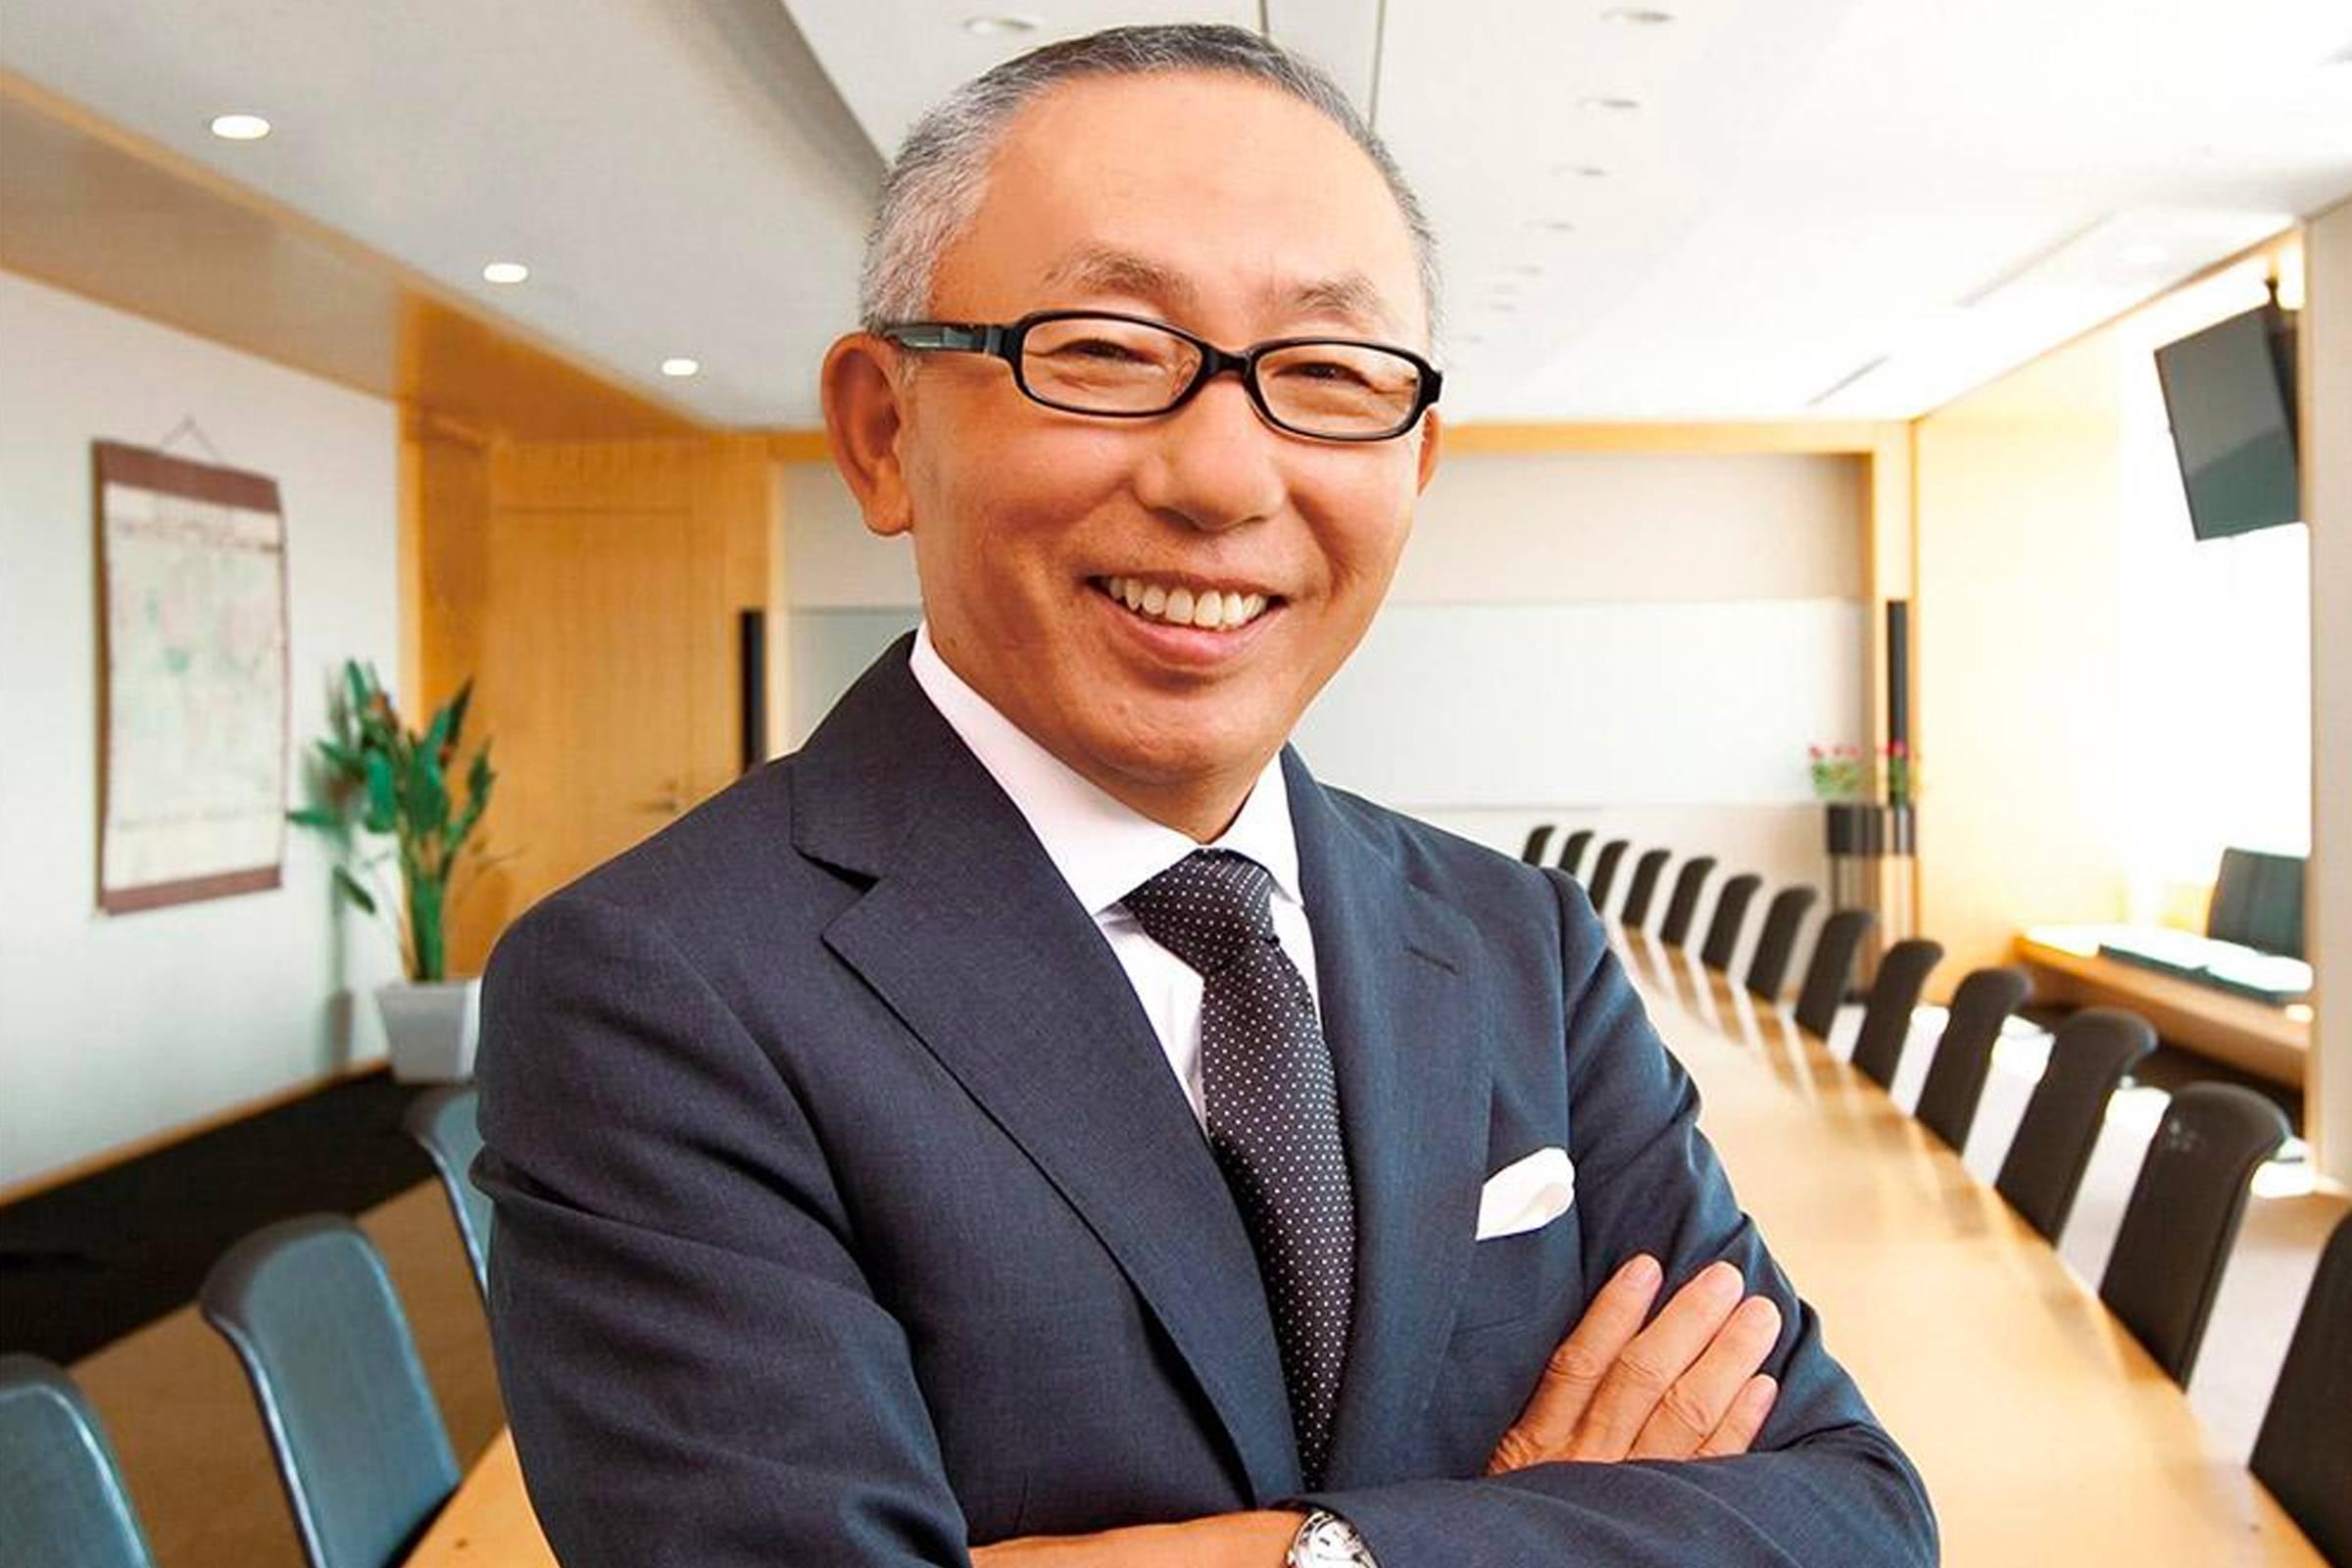 Тадаси Янаи, основатель и президент Fast Retailing и Uniqlo